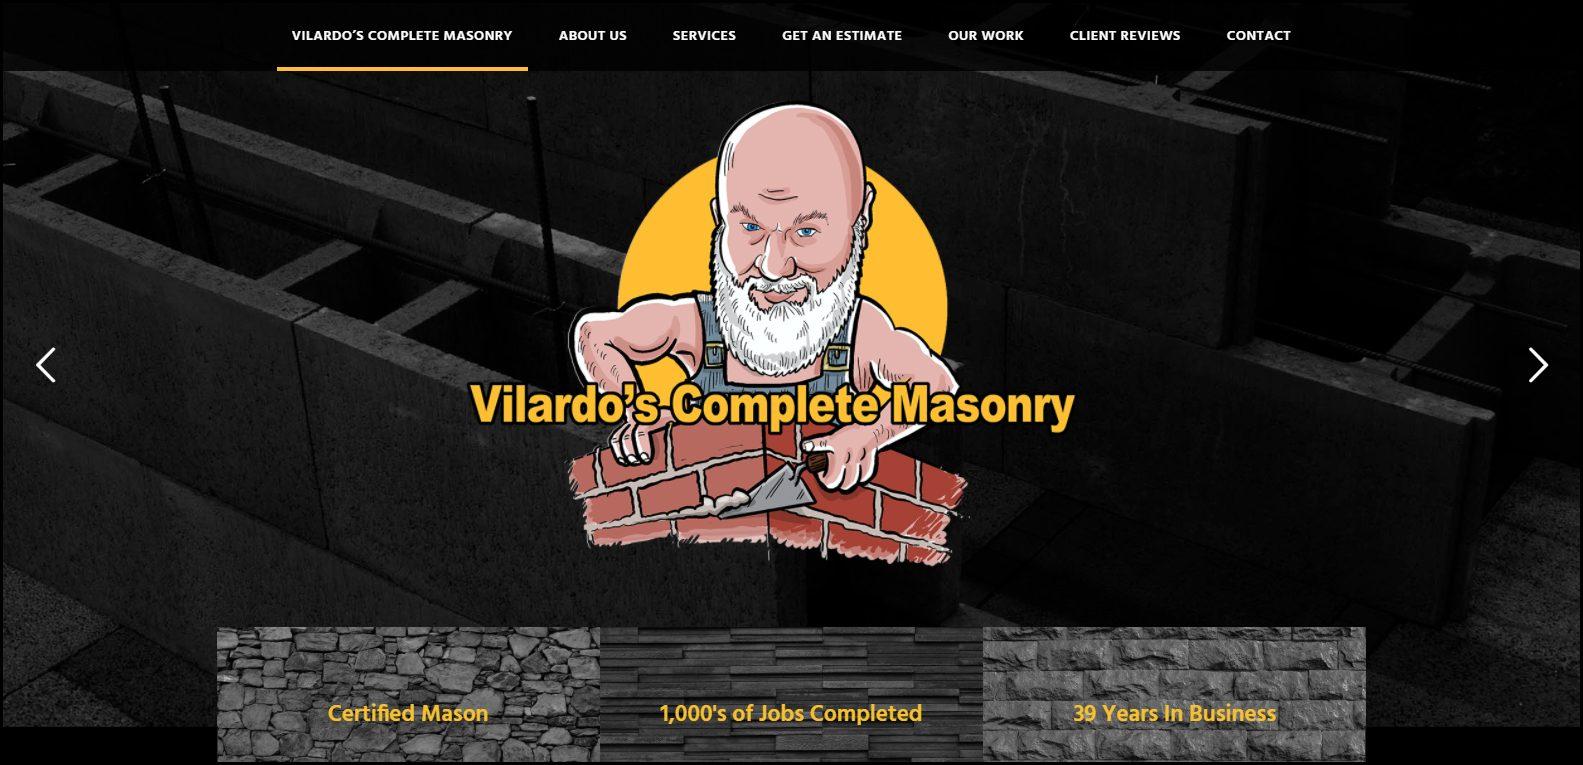 Vilardo Screen Grab 1